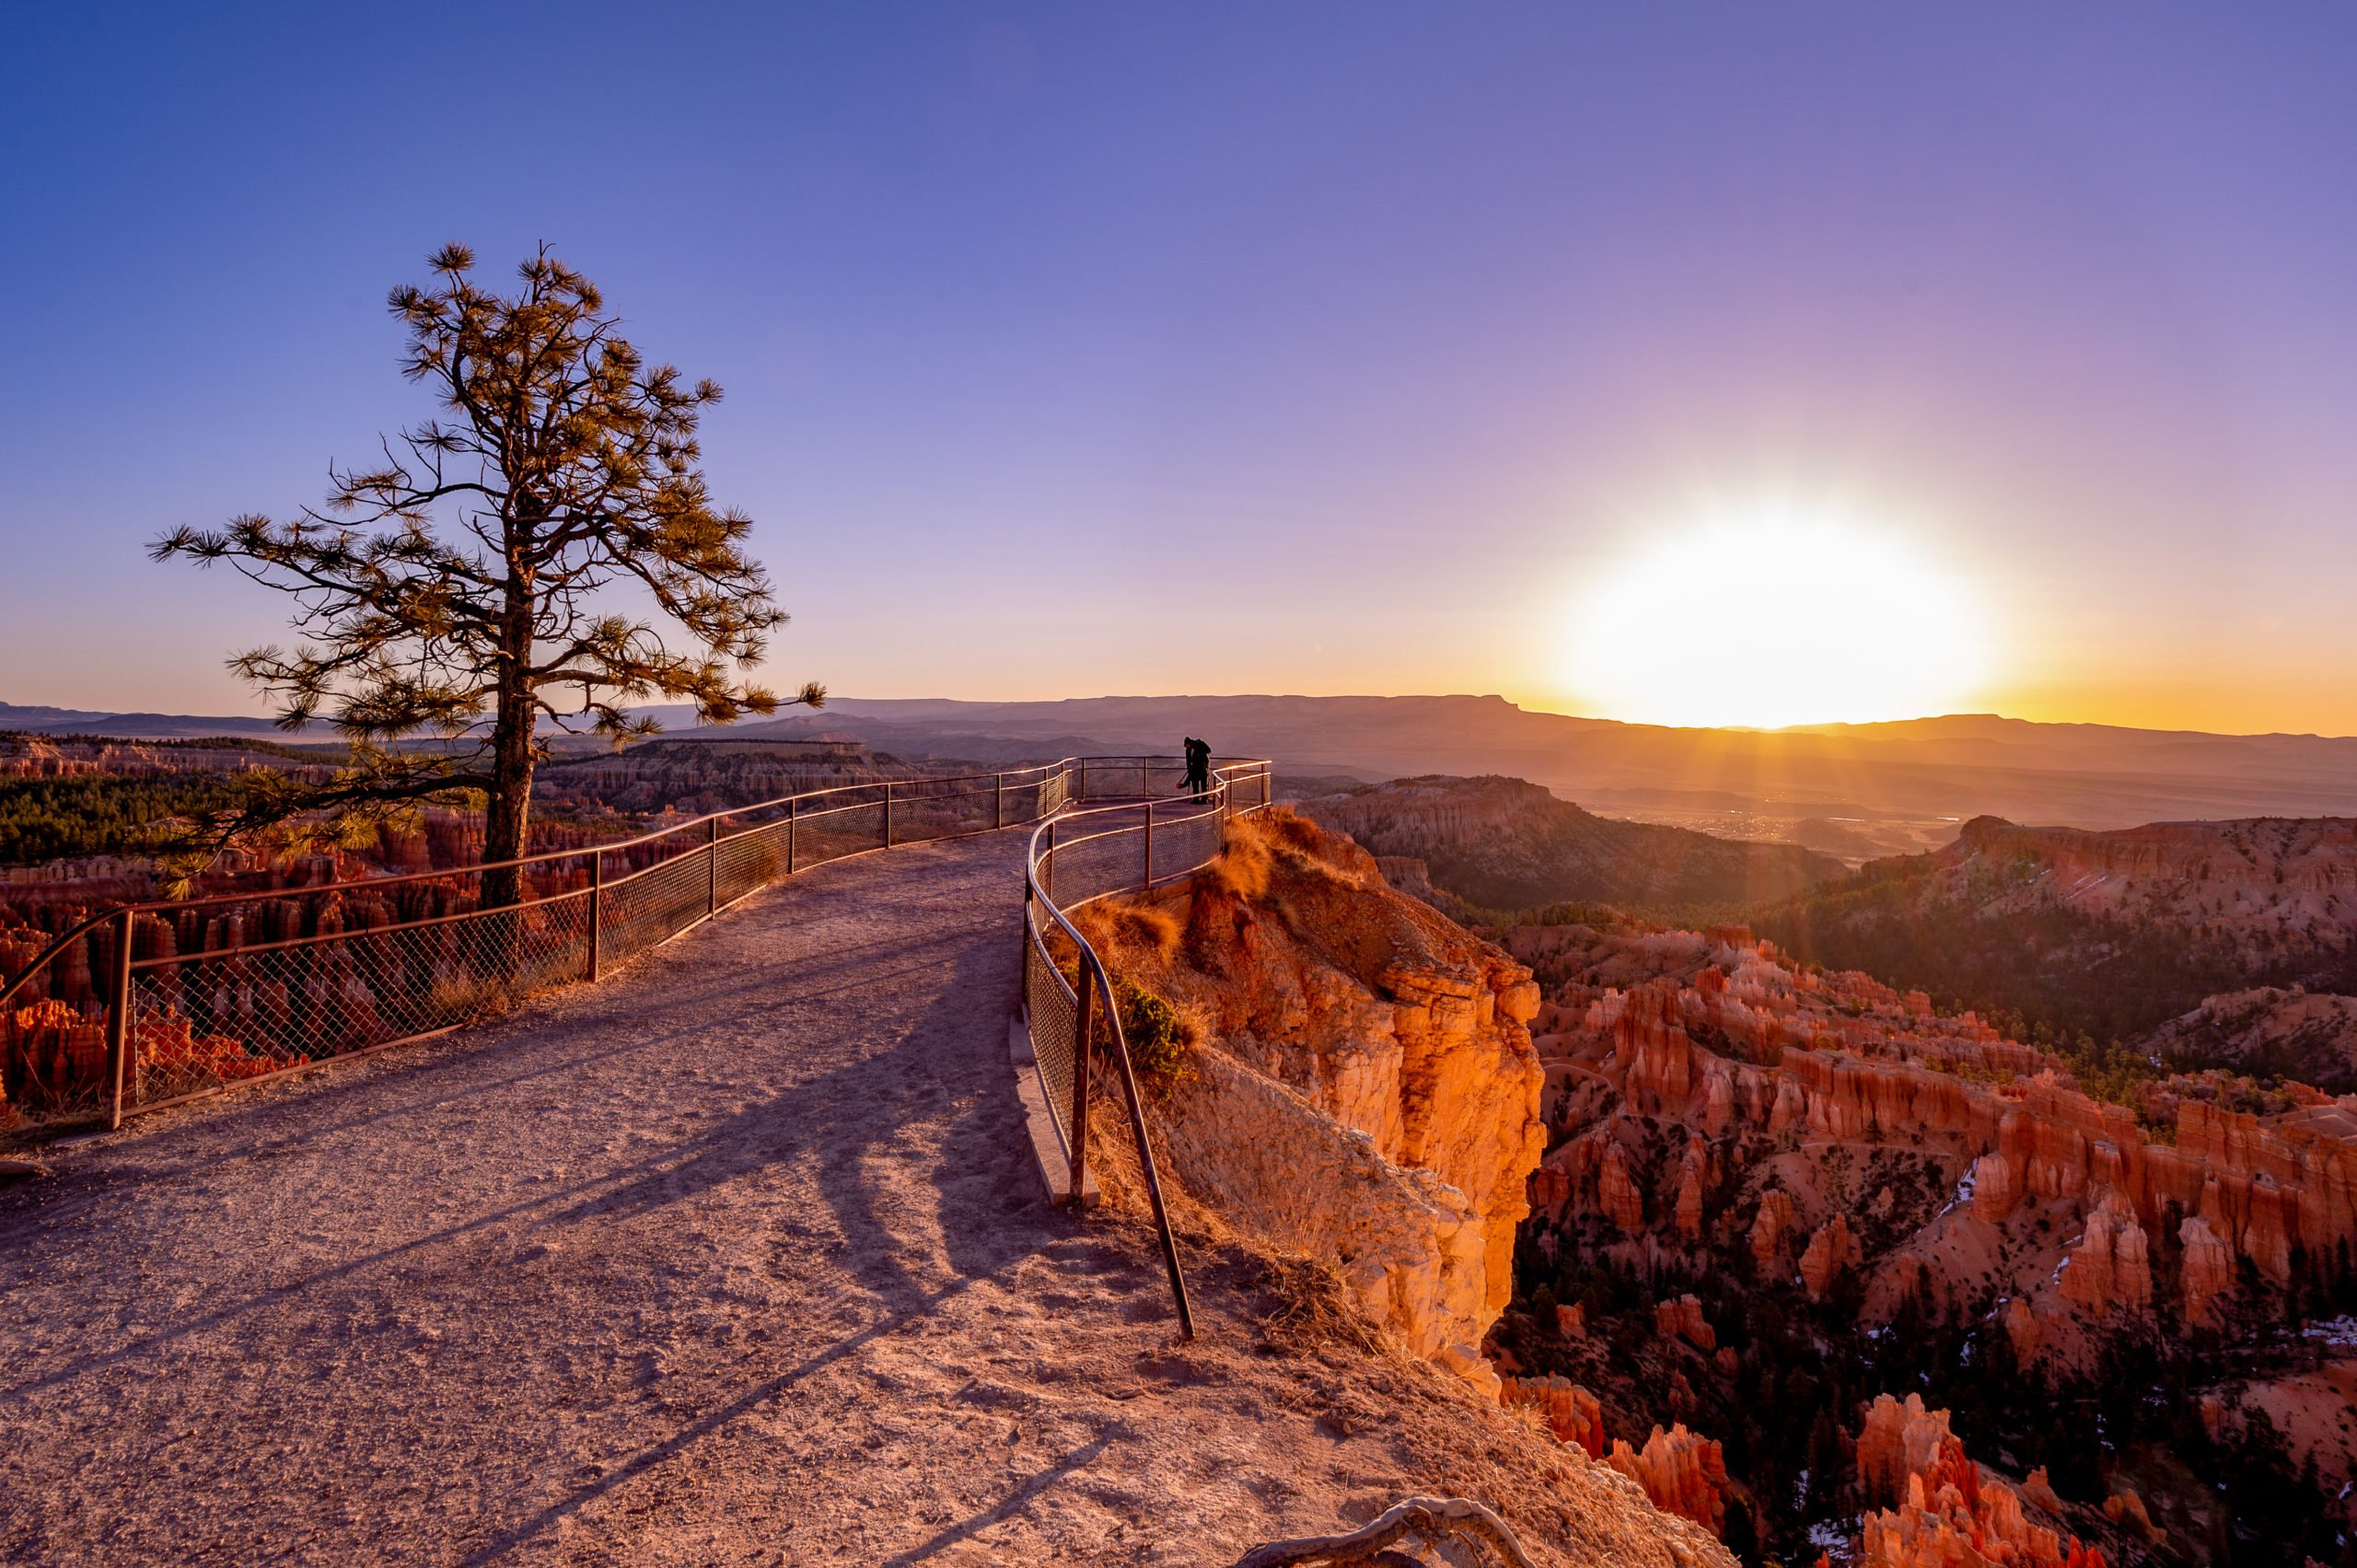 Upper Viewpoint